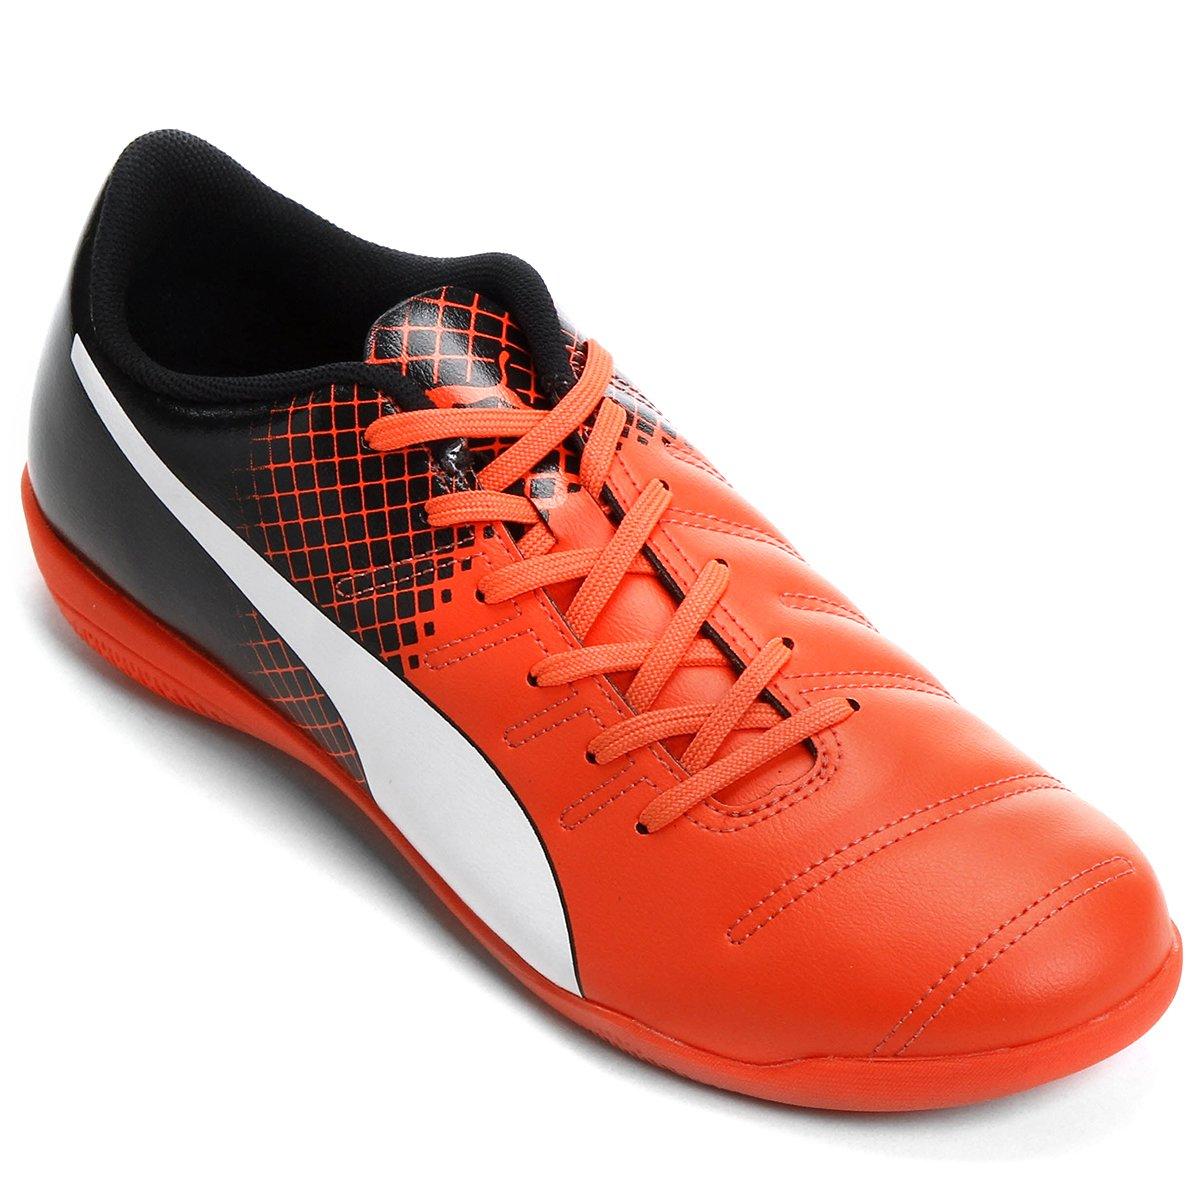 1cfb8de799 Chuteira futsal puma evopower tricks it masculina compre agora jpg  1200x1200 Chuteira puma duas cor